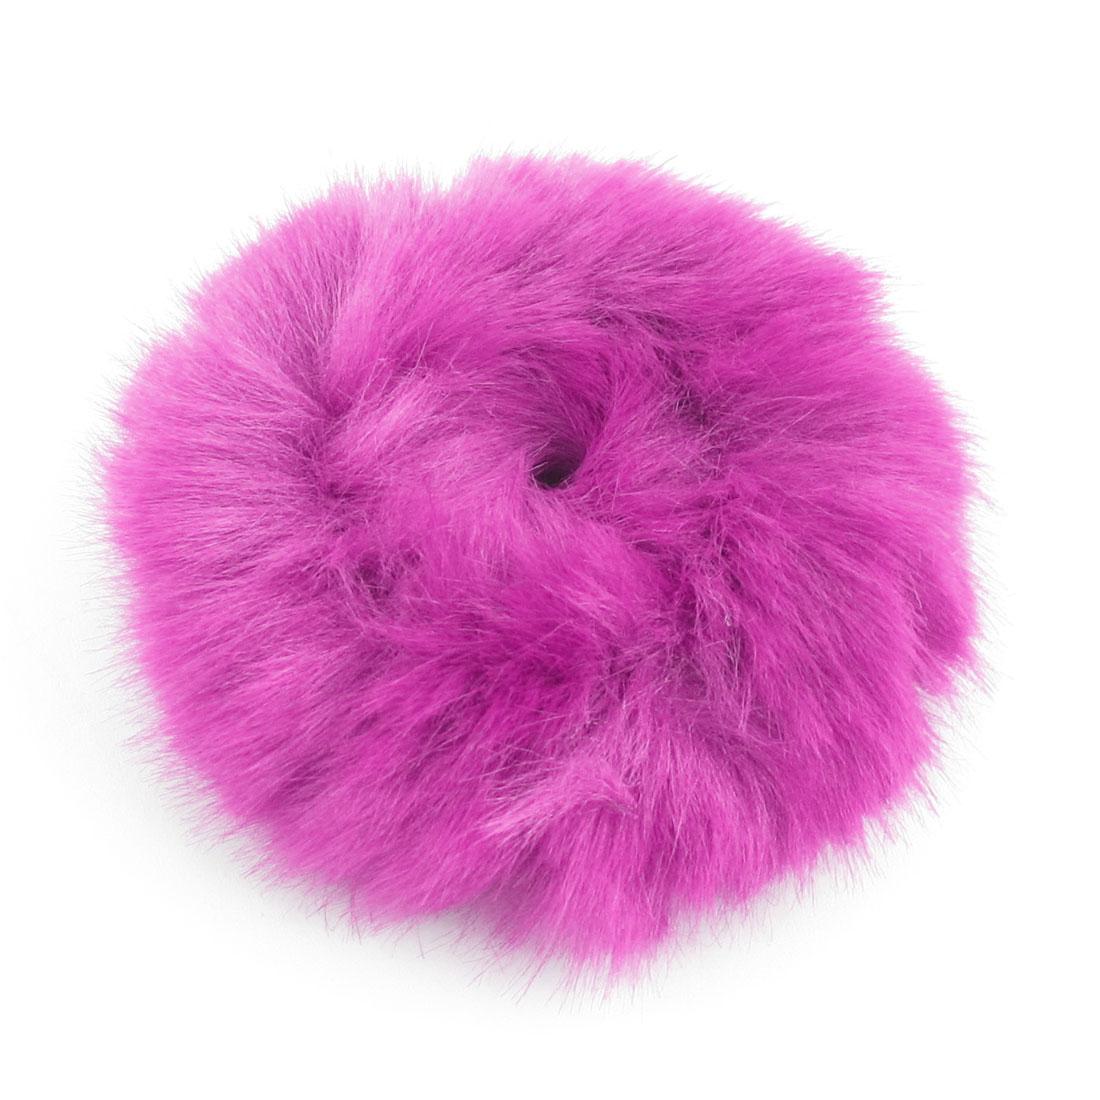 Hair Ornament Fuchsia Plush Elastic Ponytail Holder for Lady